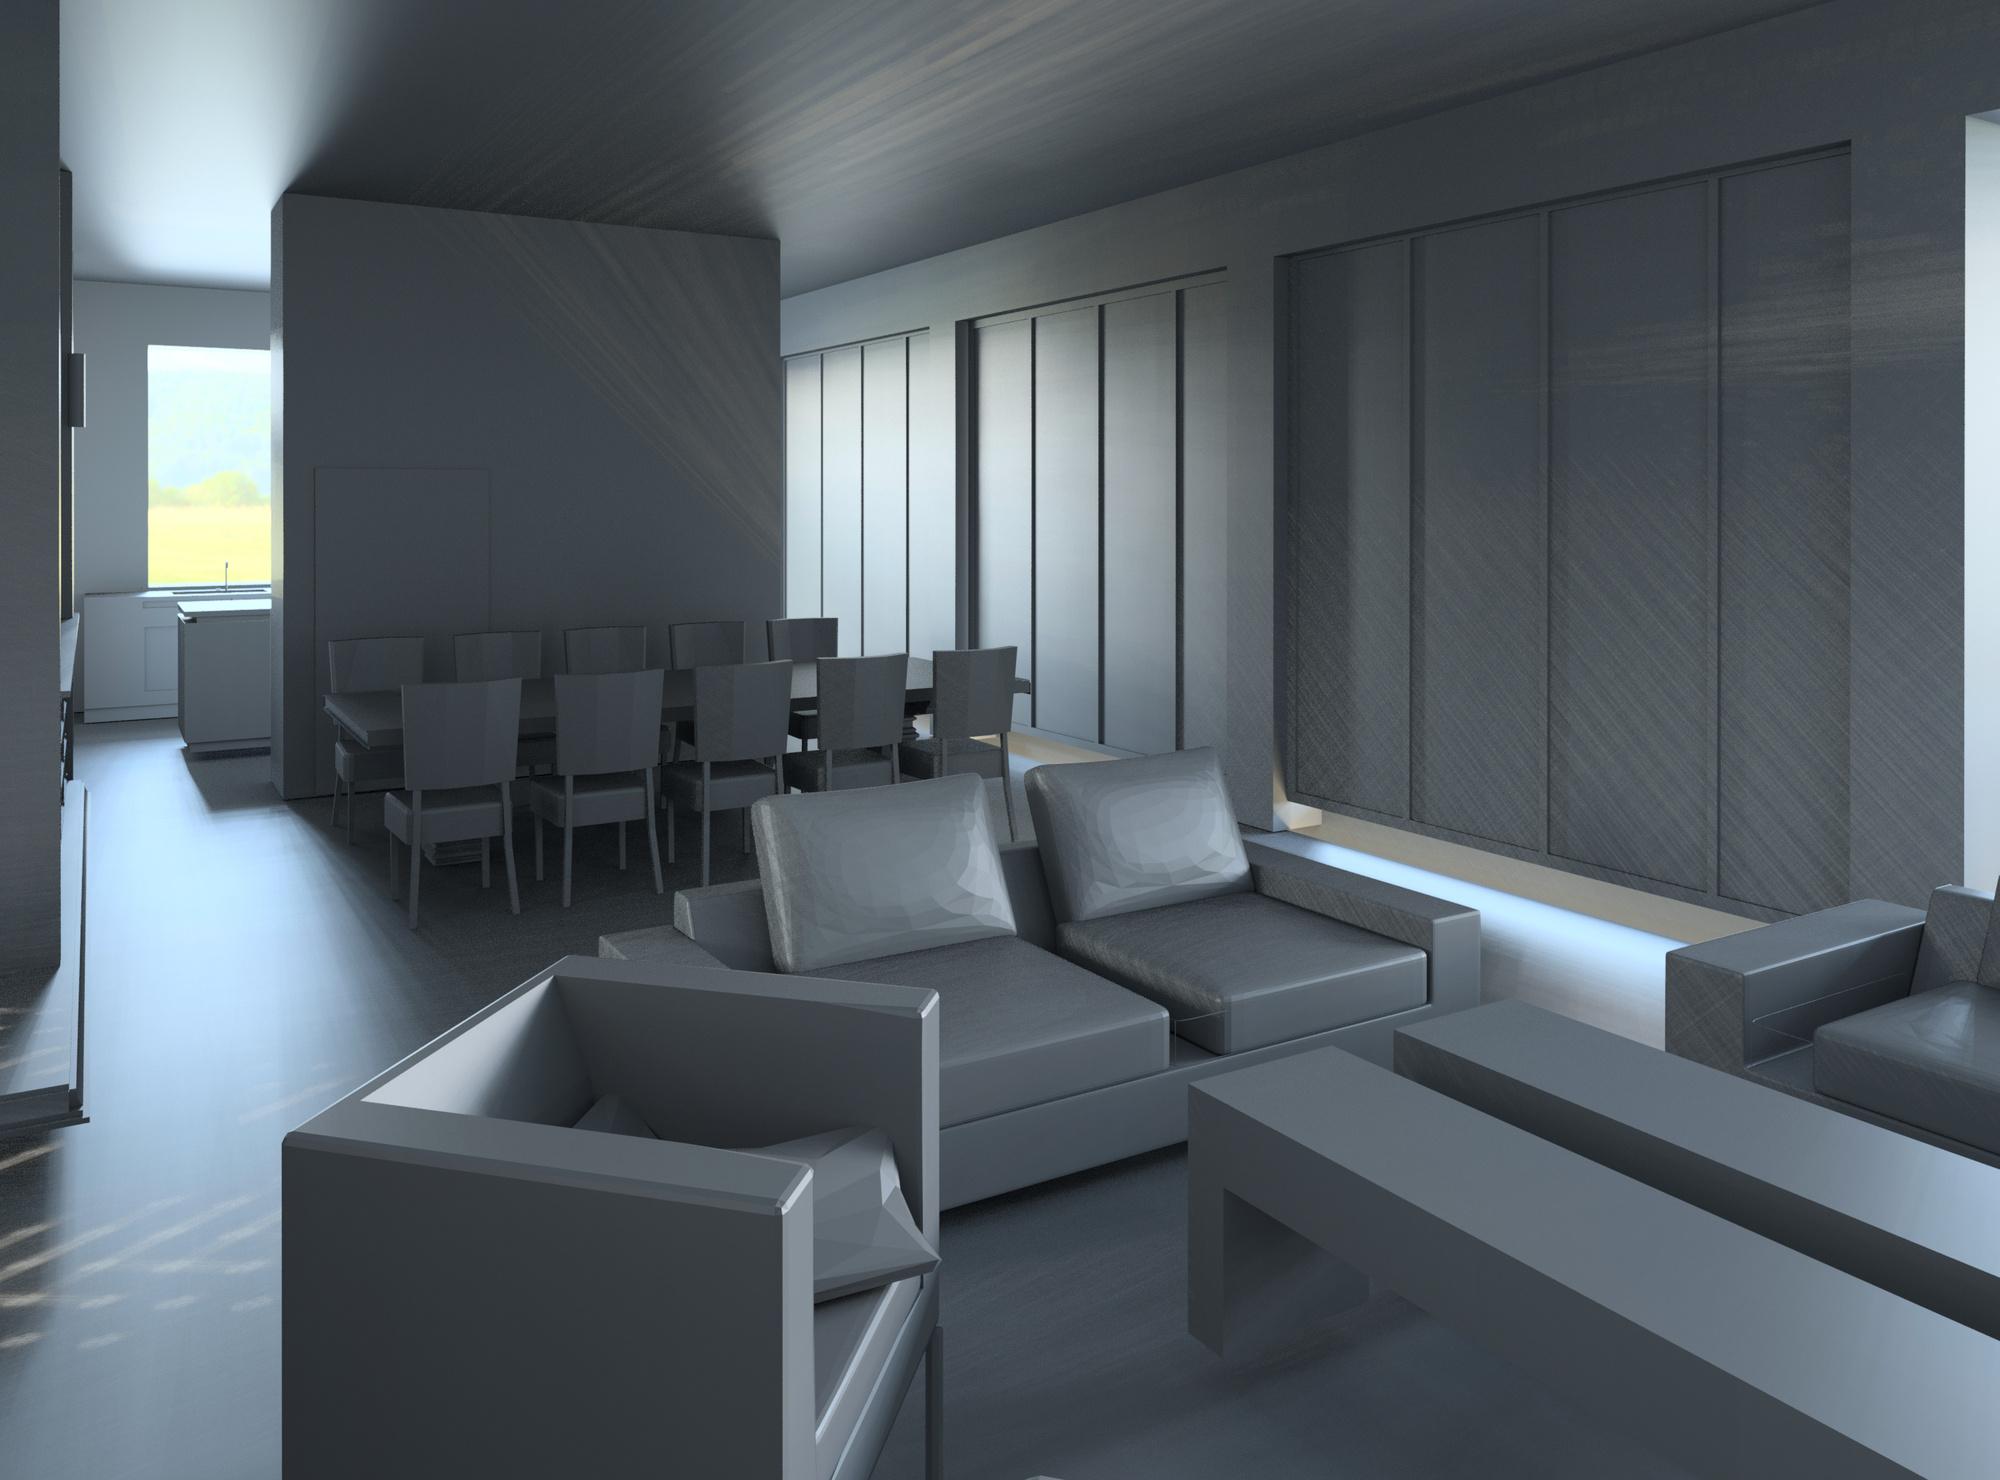 Raas-rendering20150522-30565-1cycv4f